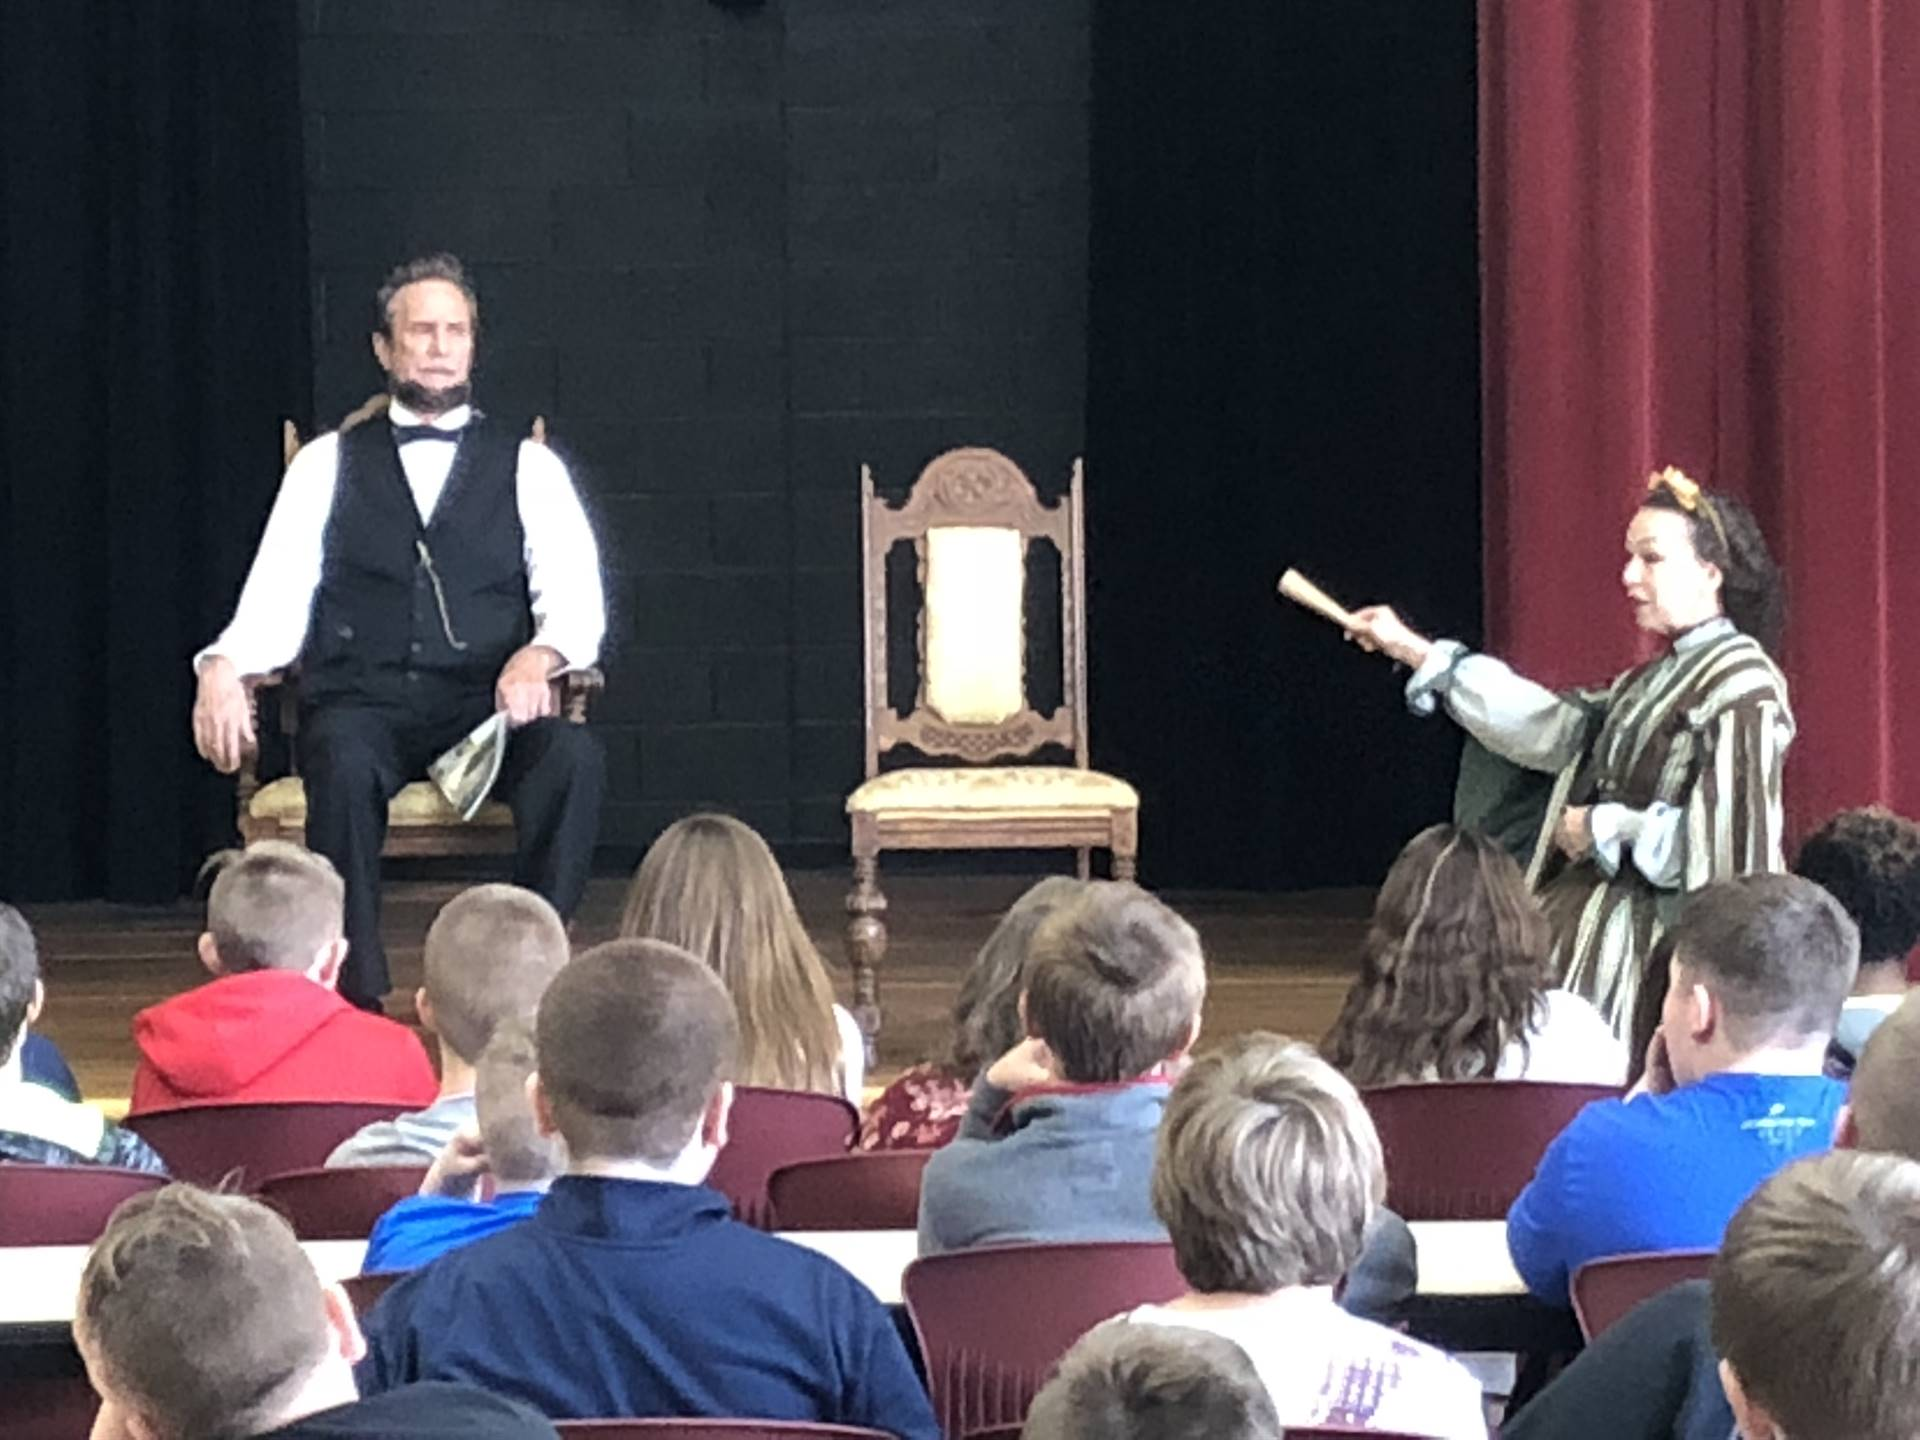 Abe Lincoln presentation